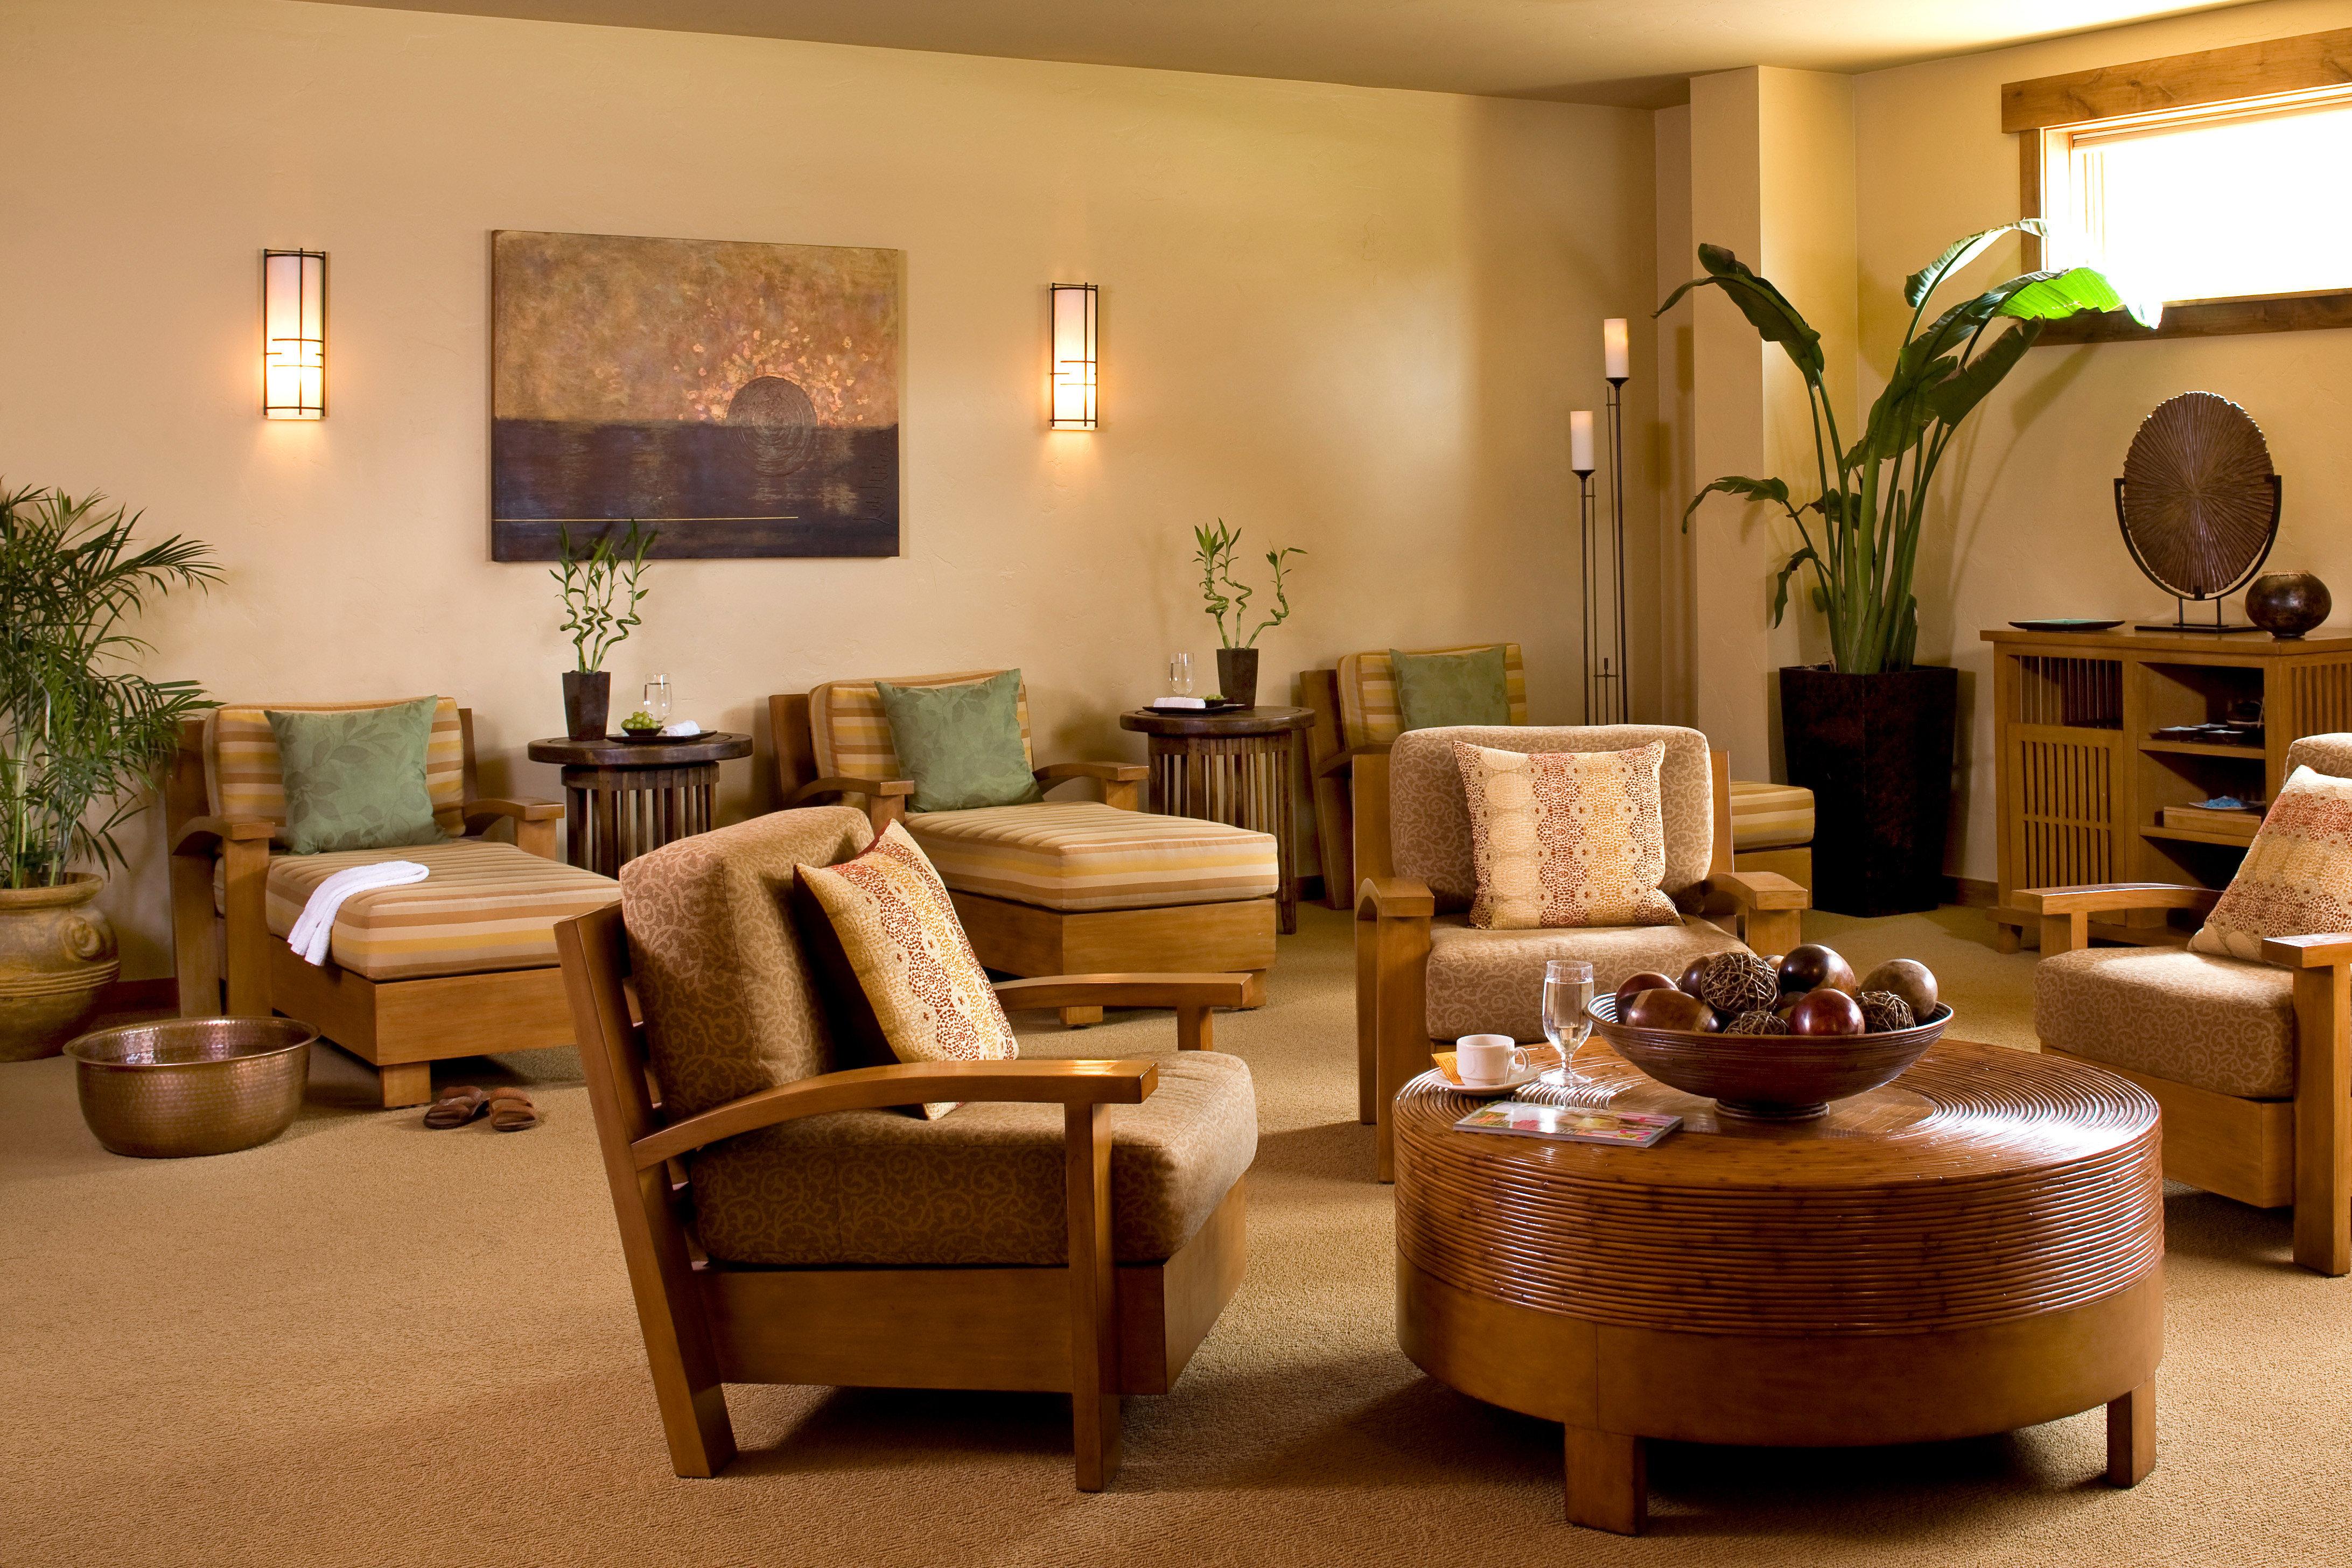 Lodge Lounge Rustic living room property home Suite hardwood condominium Lobby cottage